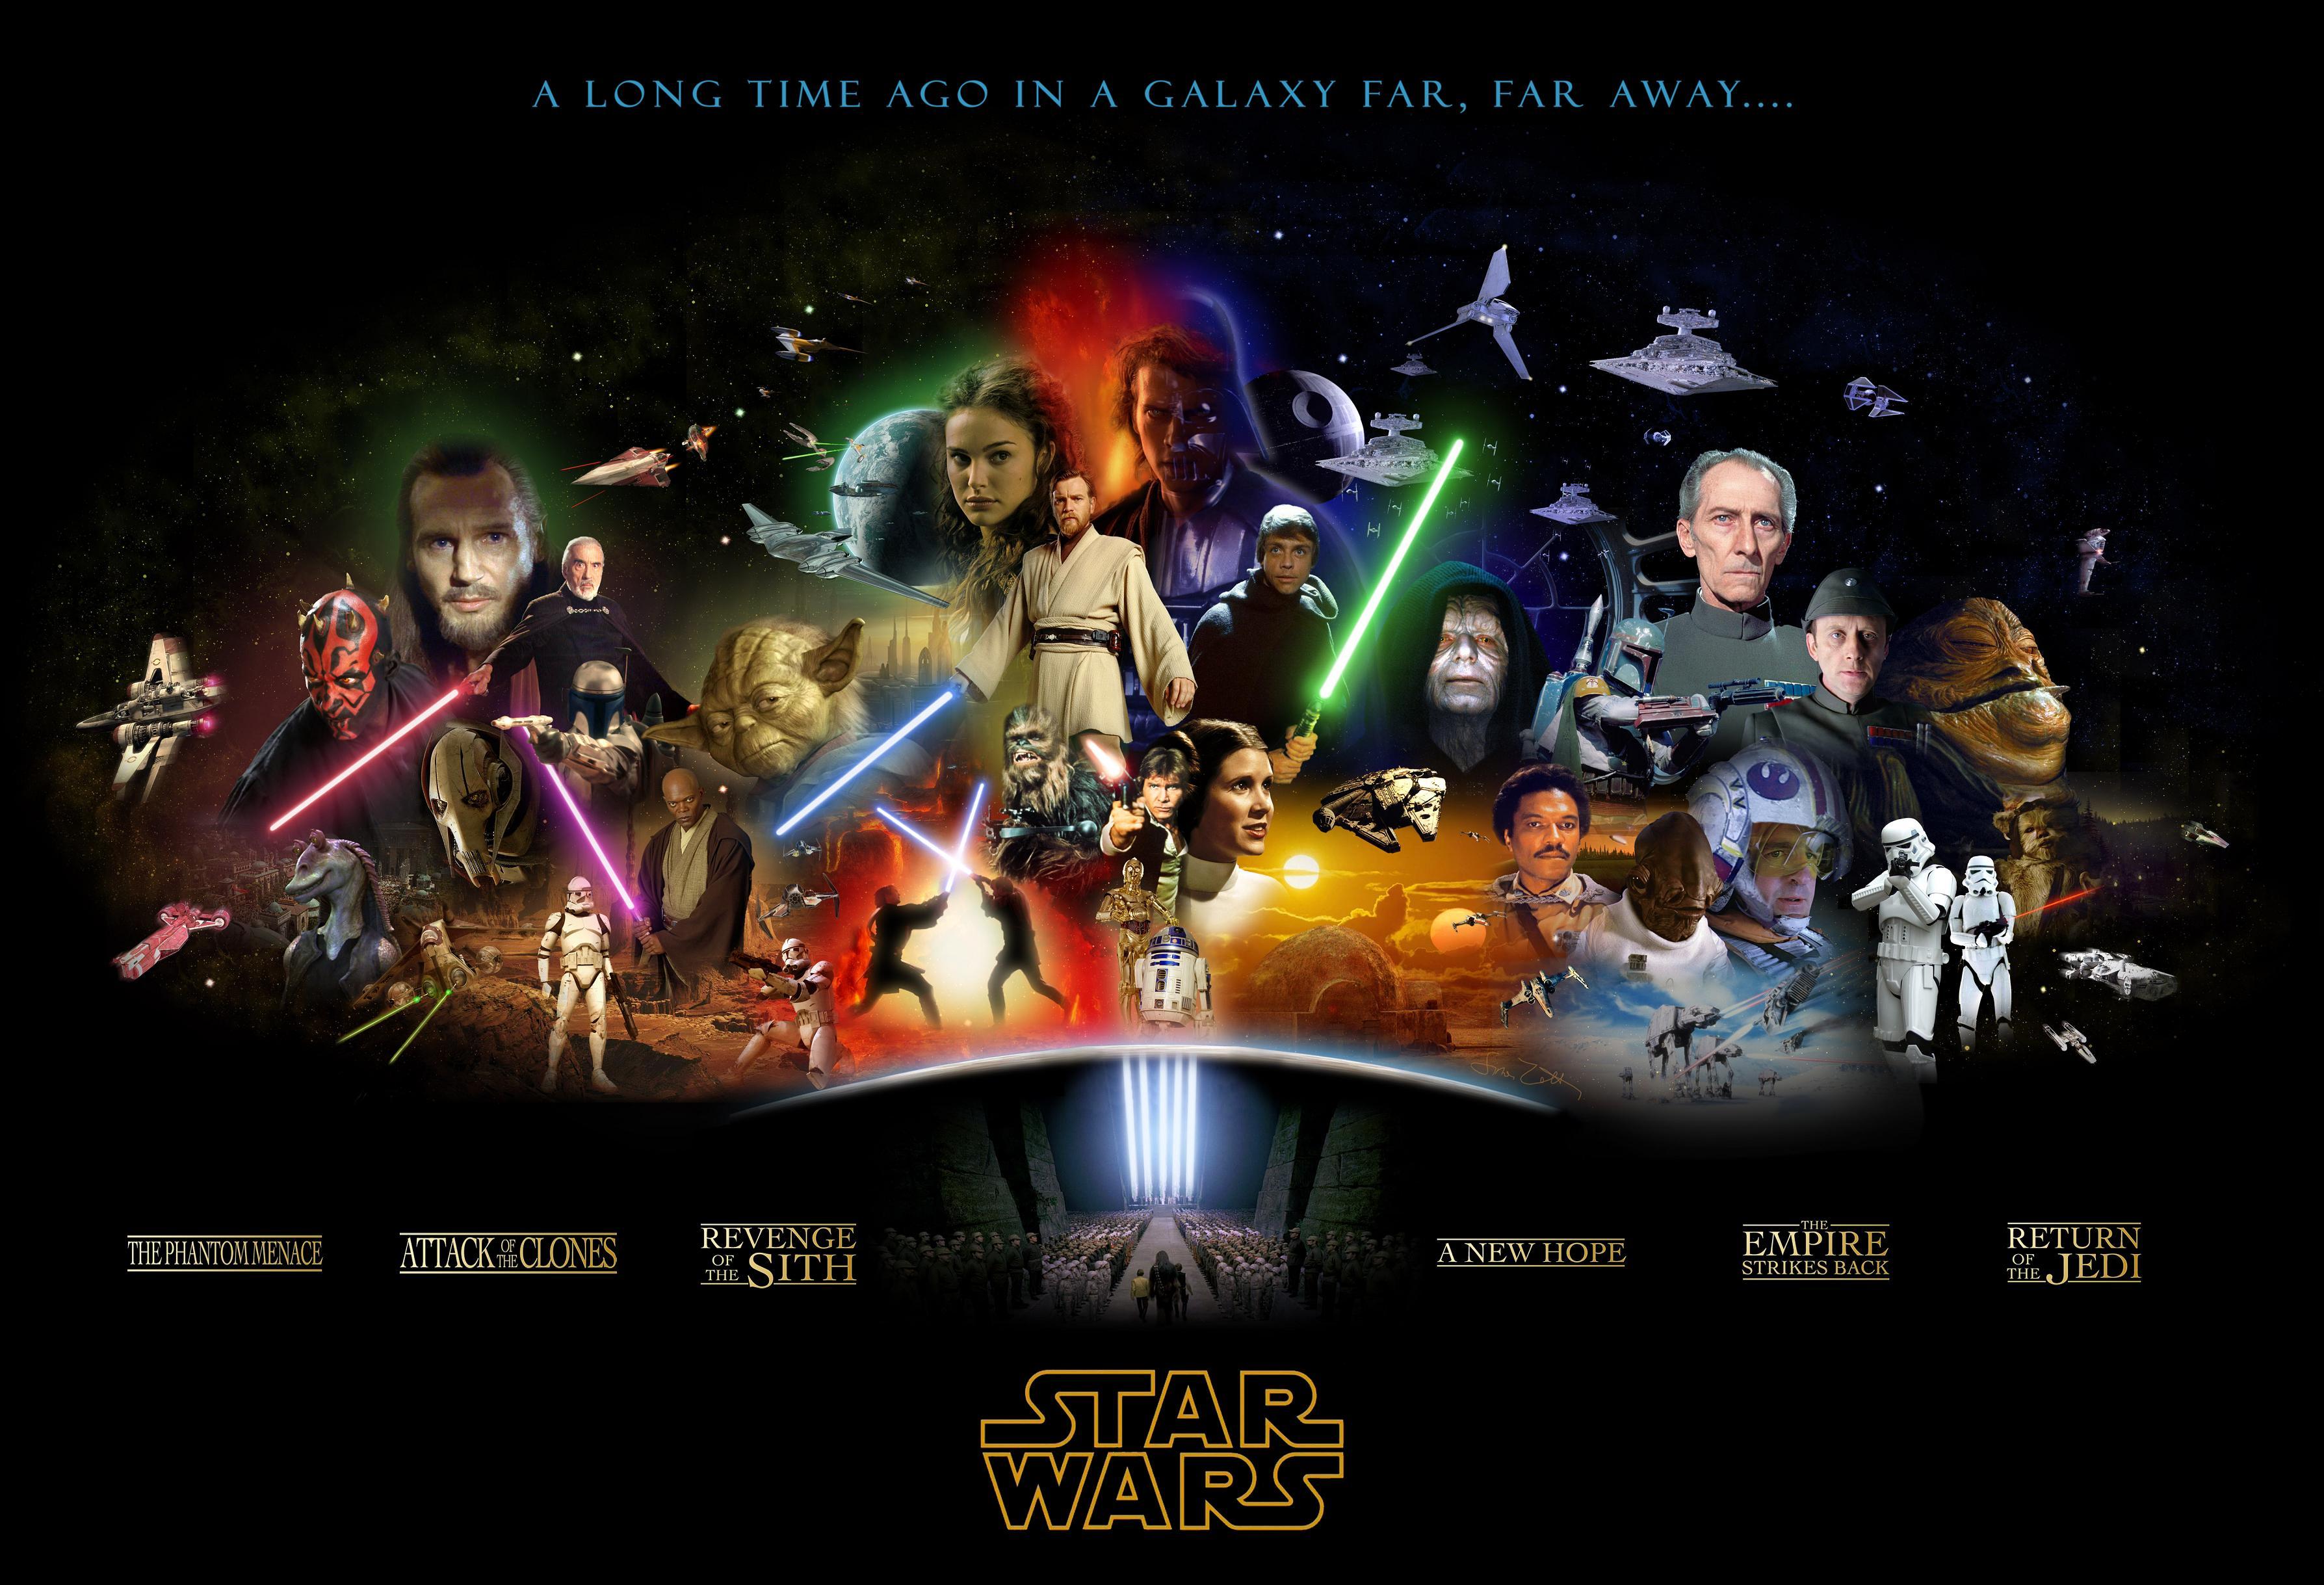 Wallpaper Star Wars Jedi Sith Laser Swords Laser Pistol Mask Obi Wan Kenobi Darth Maul Star Wars Heroes Star Wars Villains Collage Movies 3575x2438 Vaiium 1787383 Hd Wallpapers Wallhere